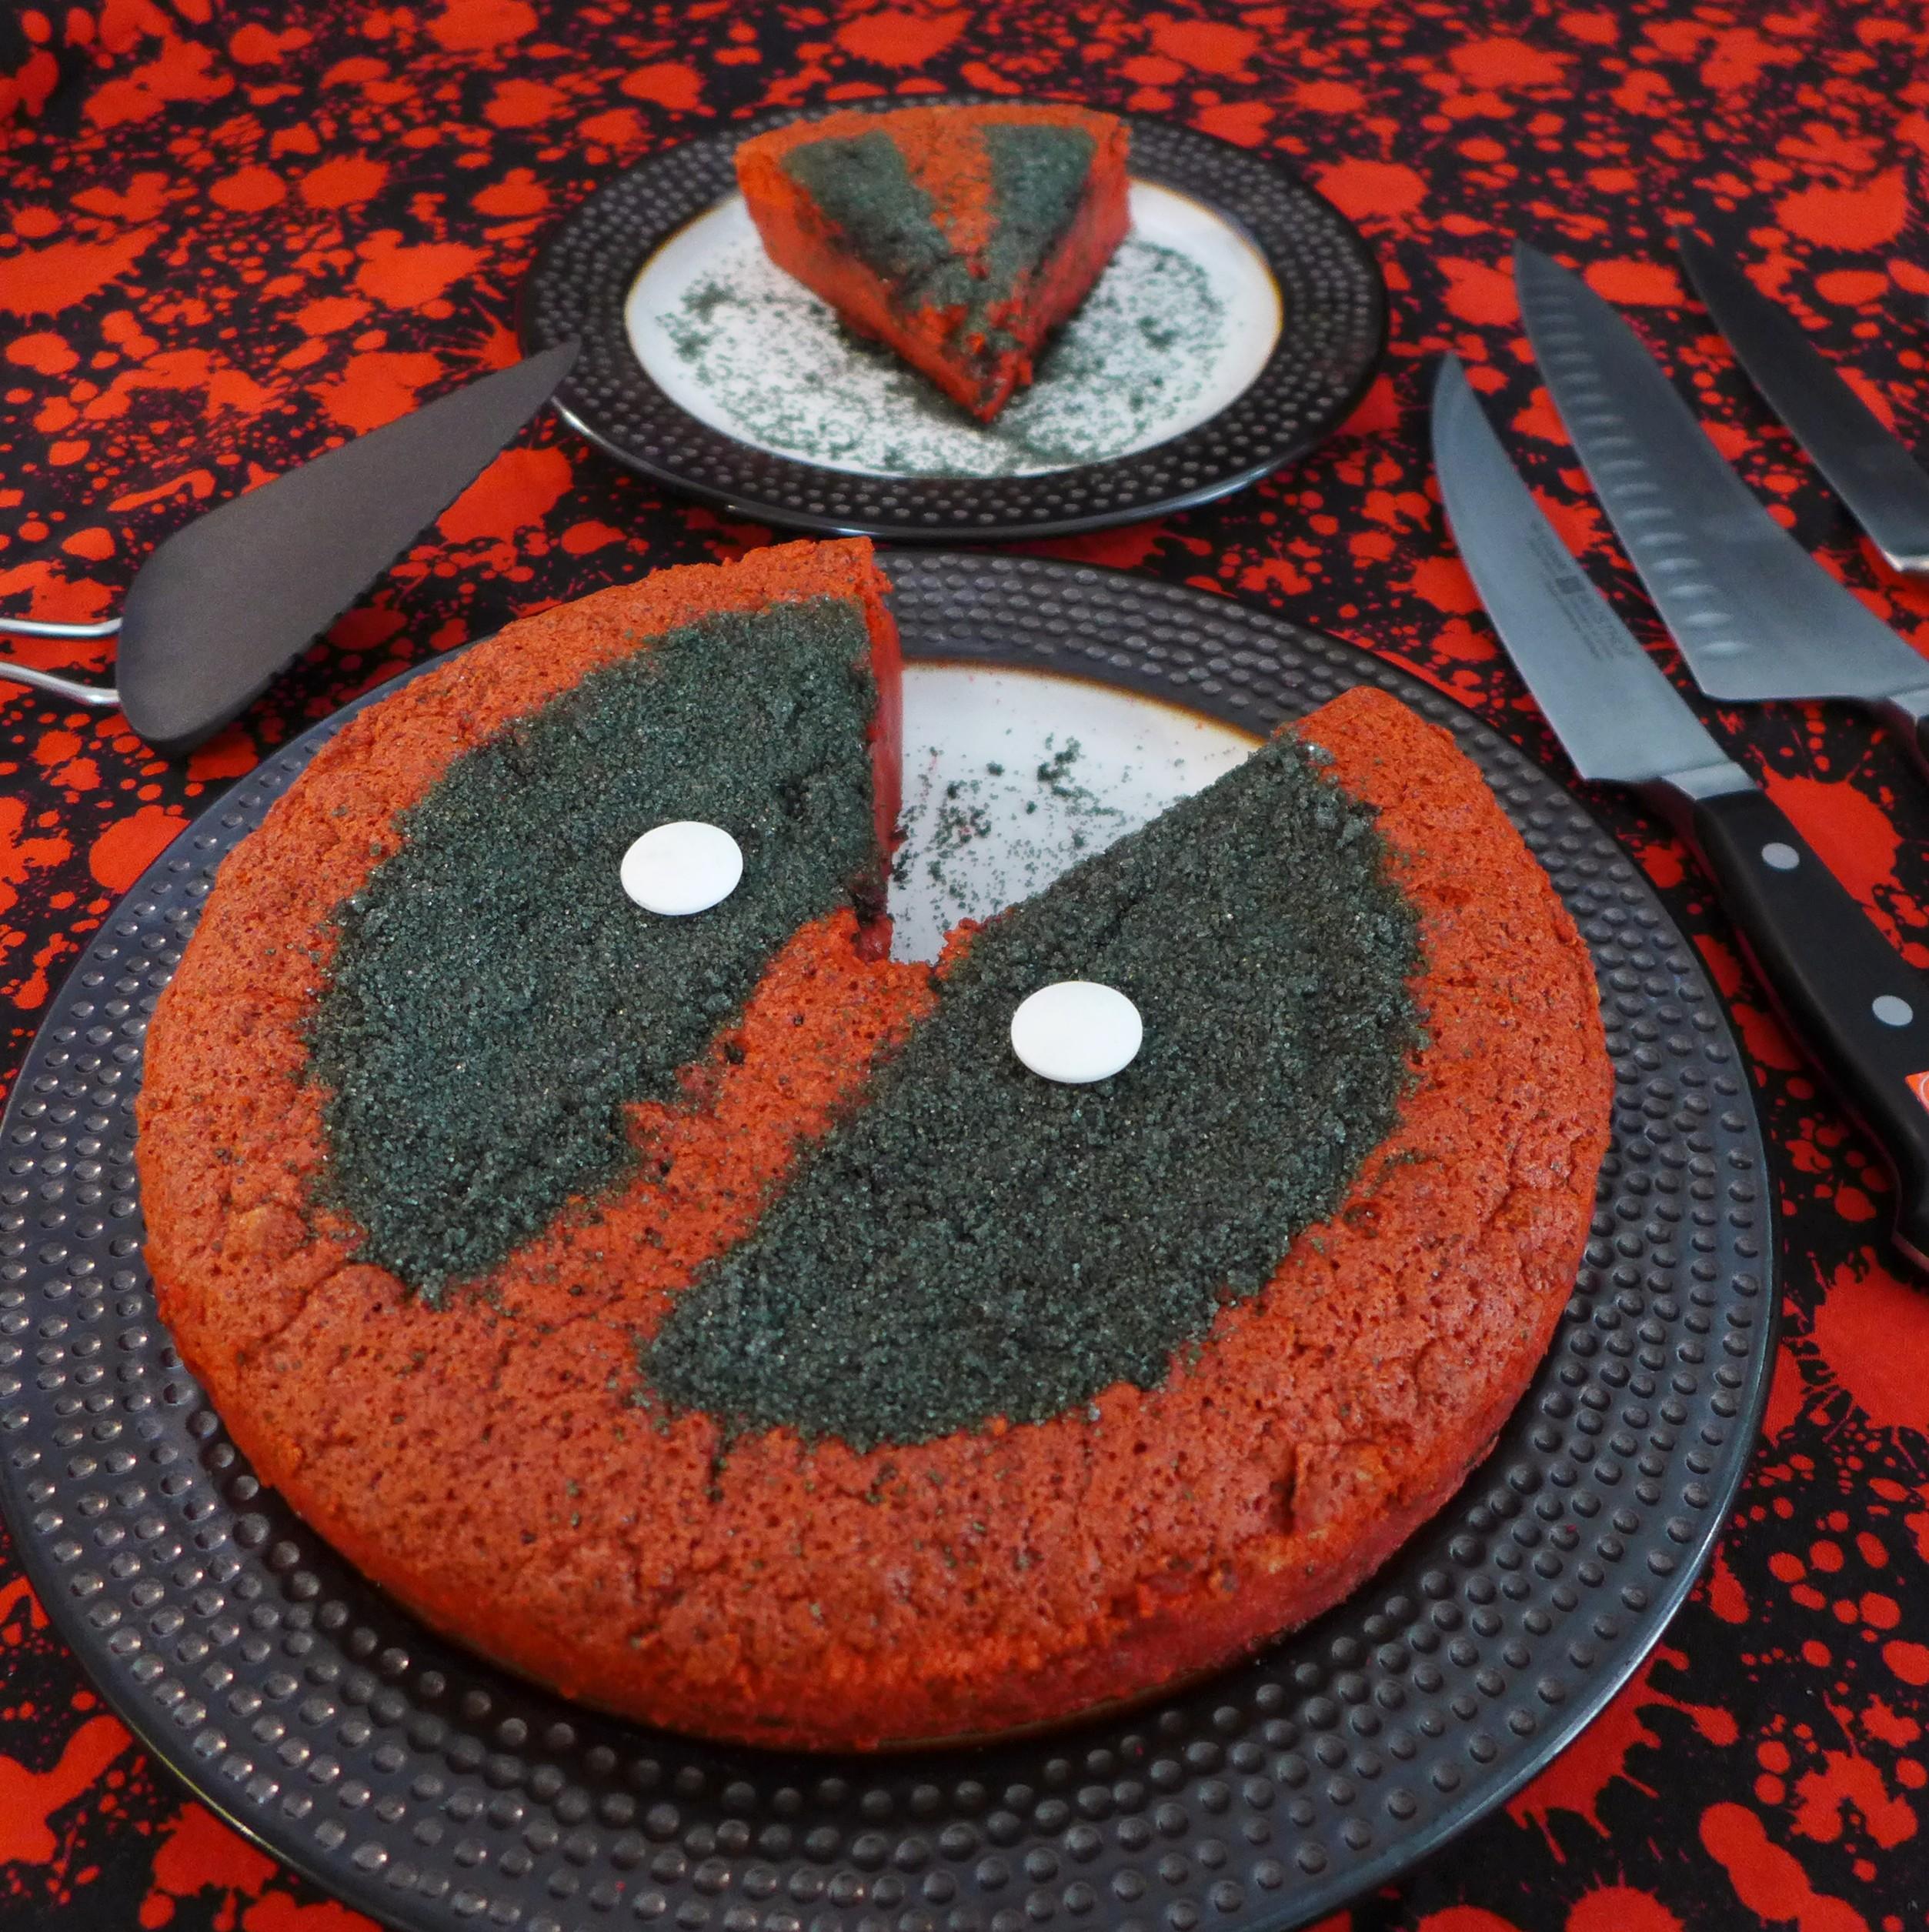 Kitchen Overlord's Deadpool Magic Cake 07